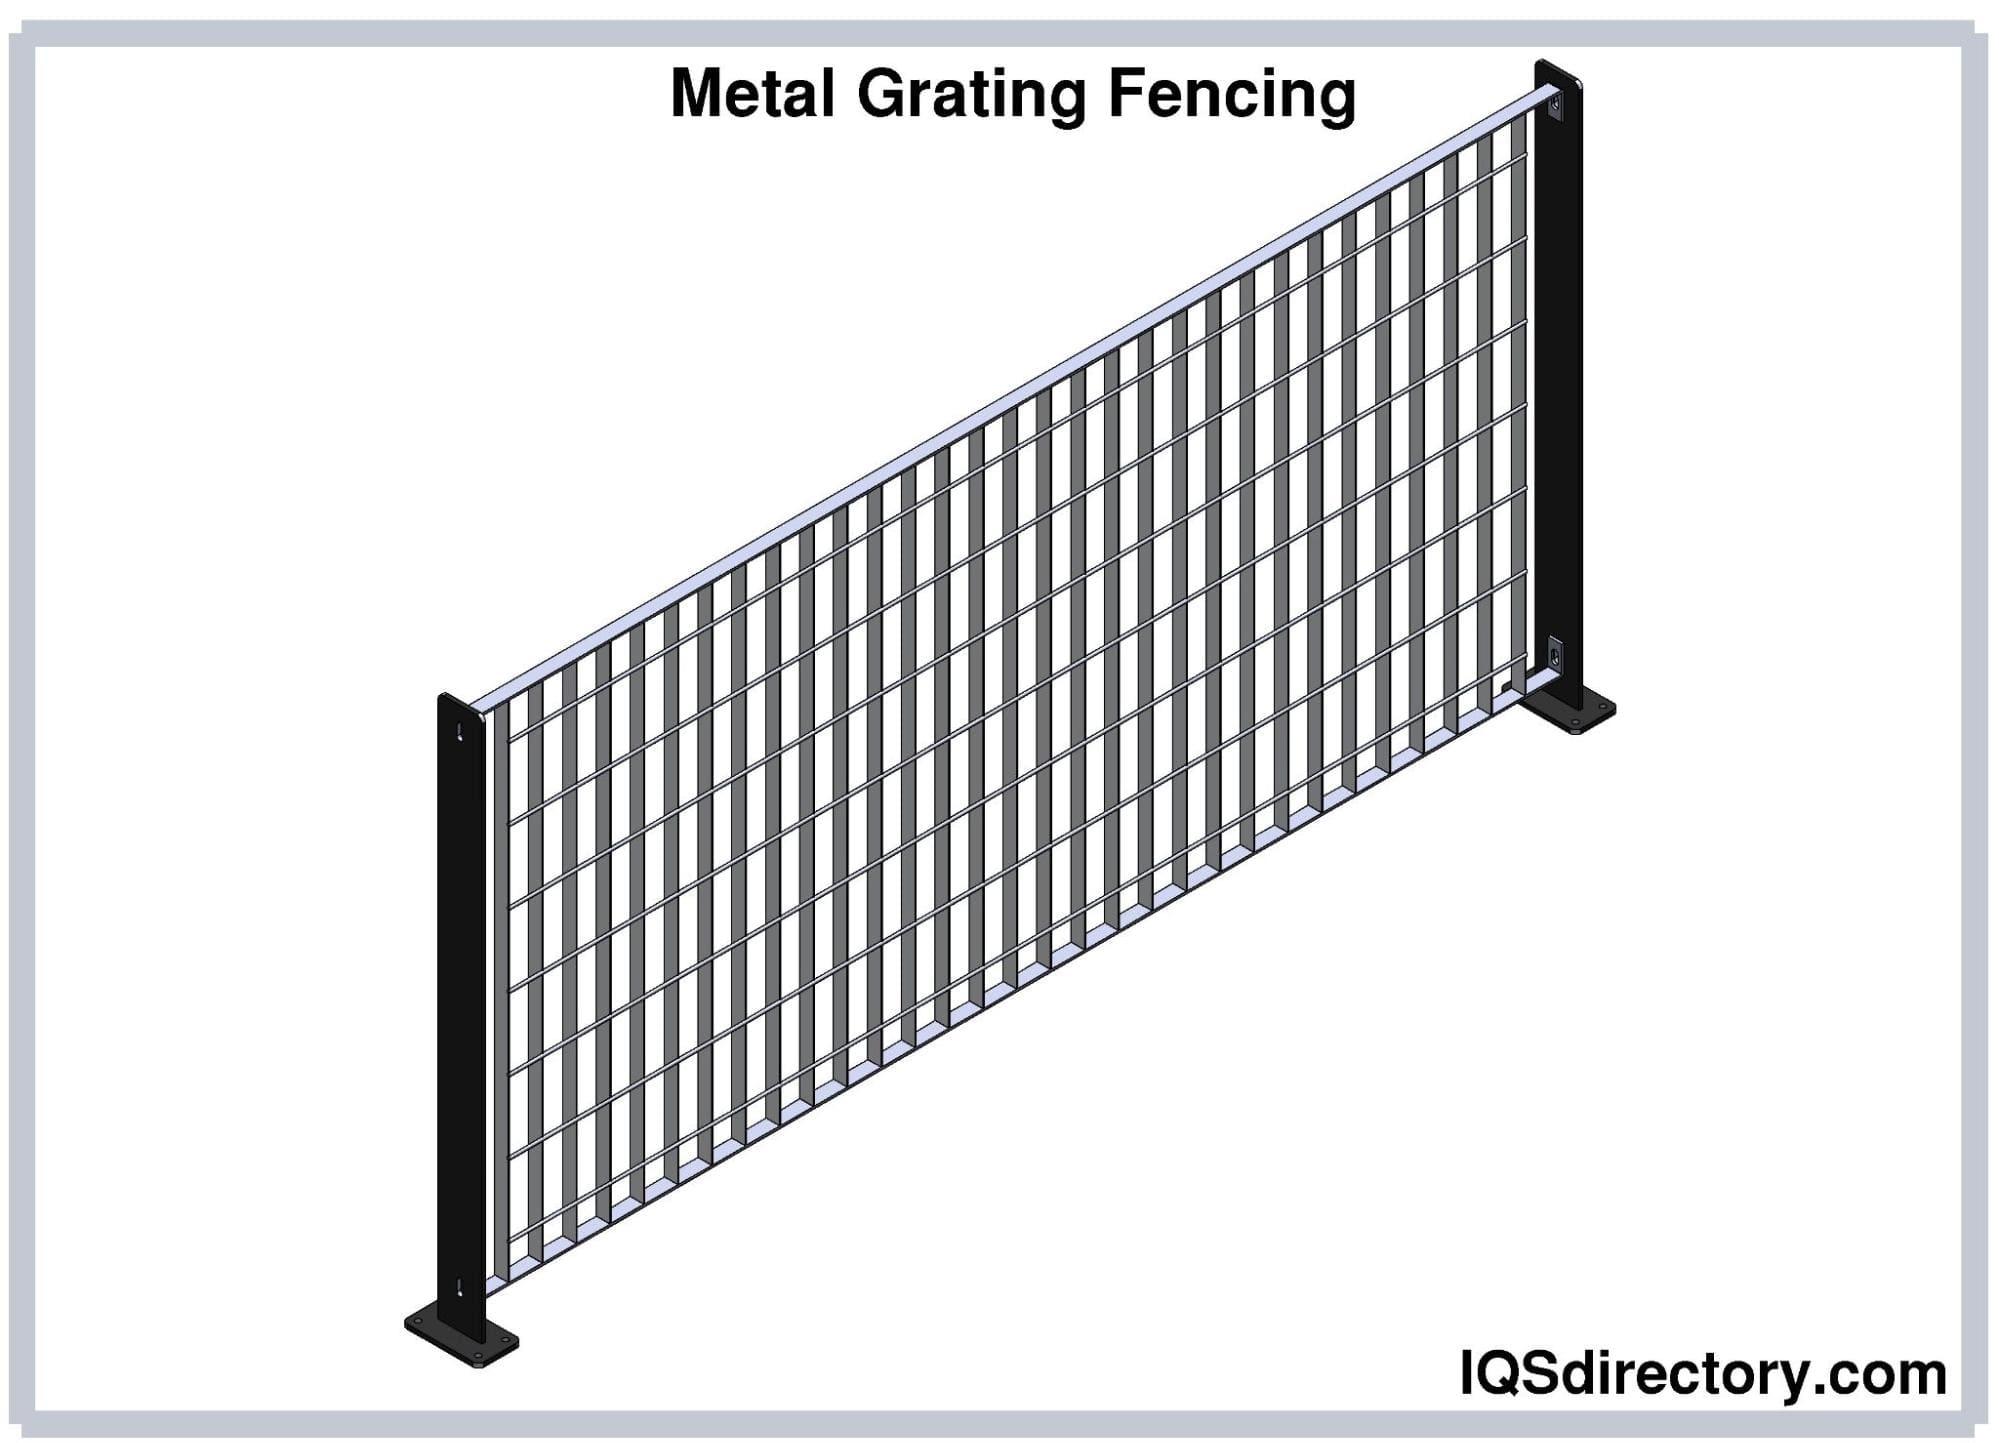 Metal Grating Fencing